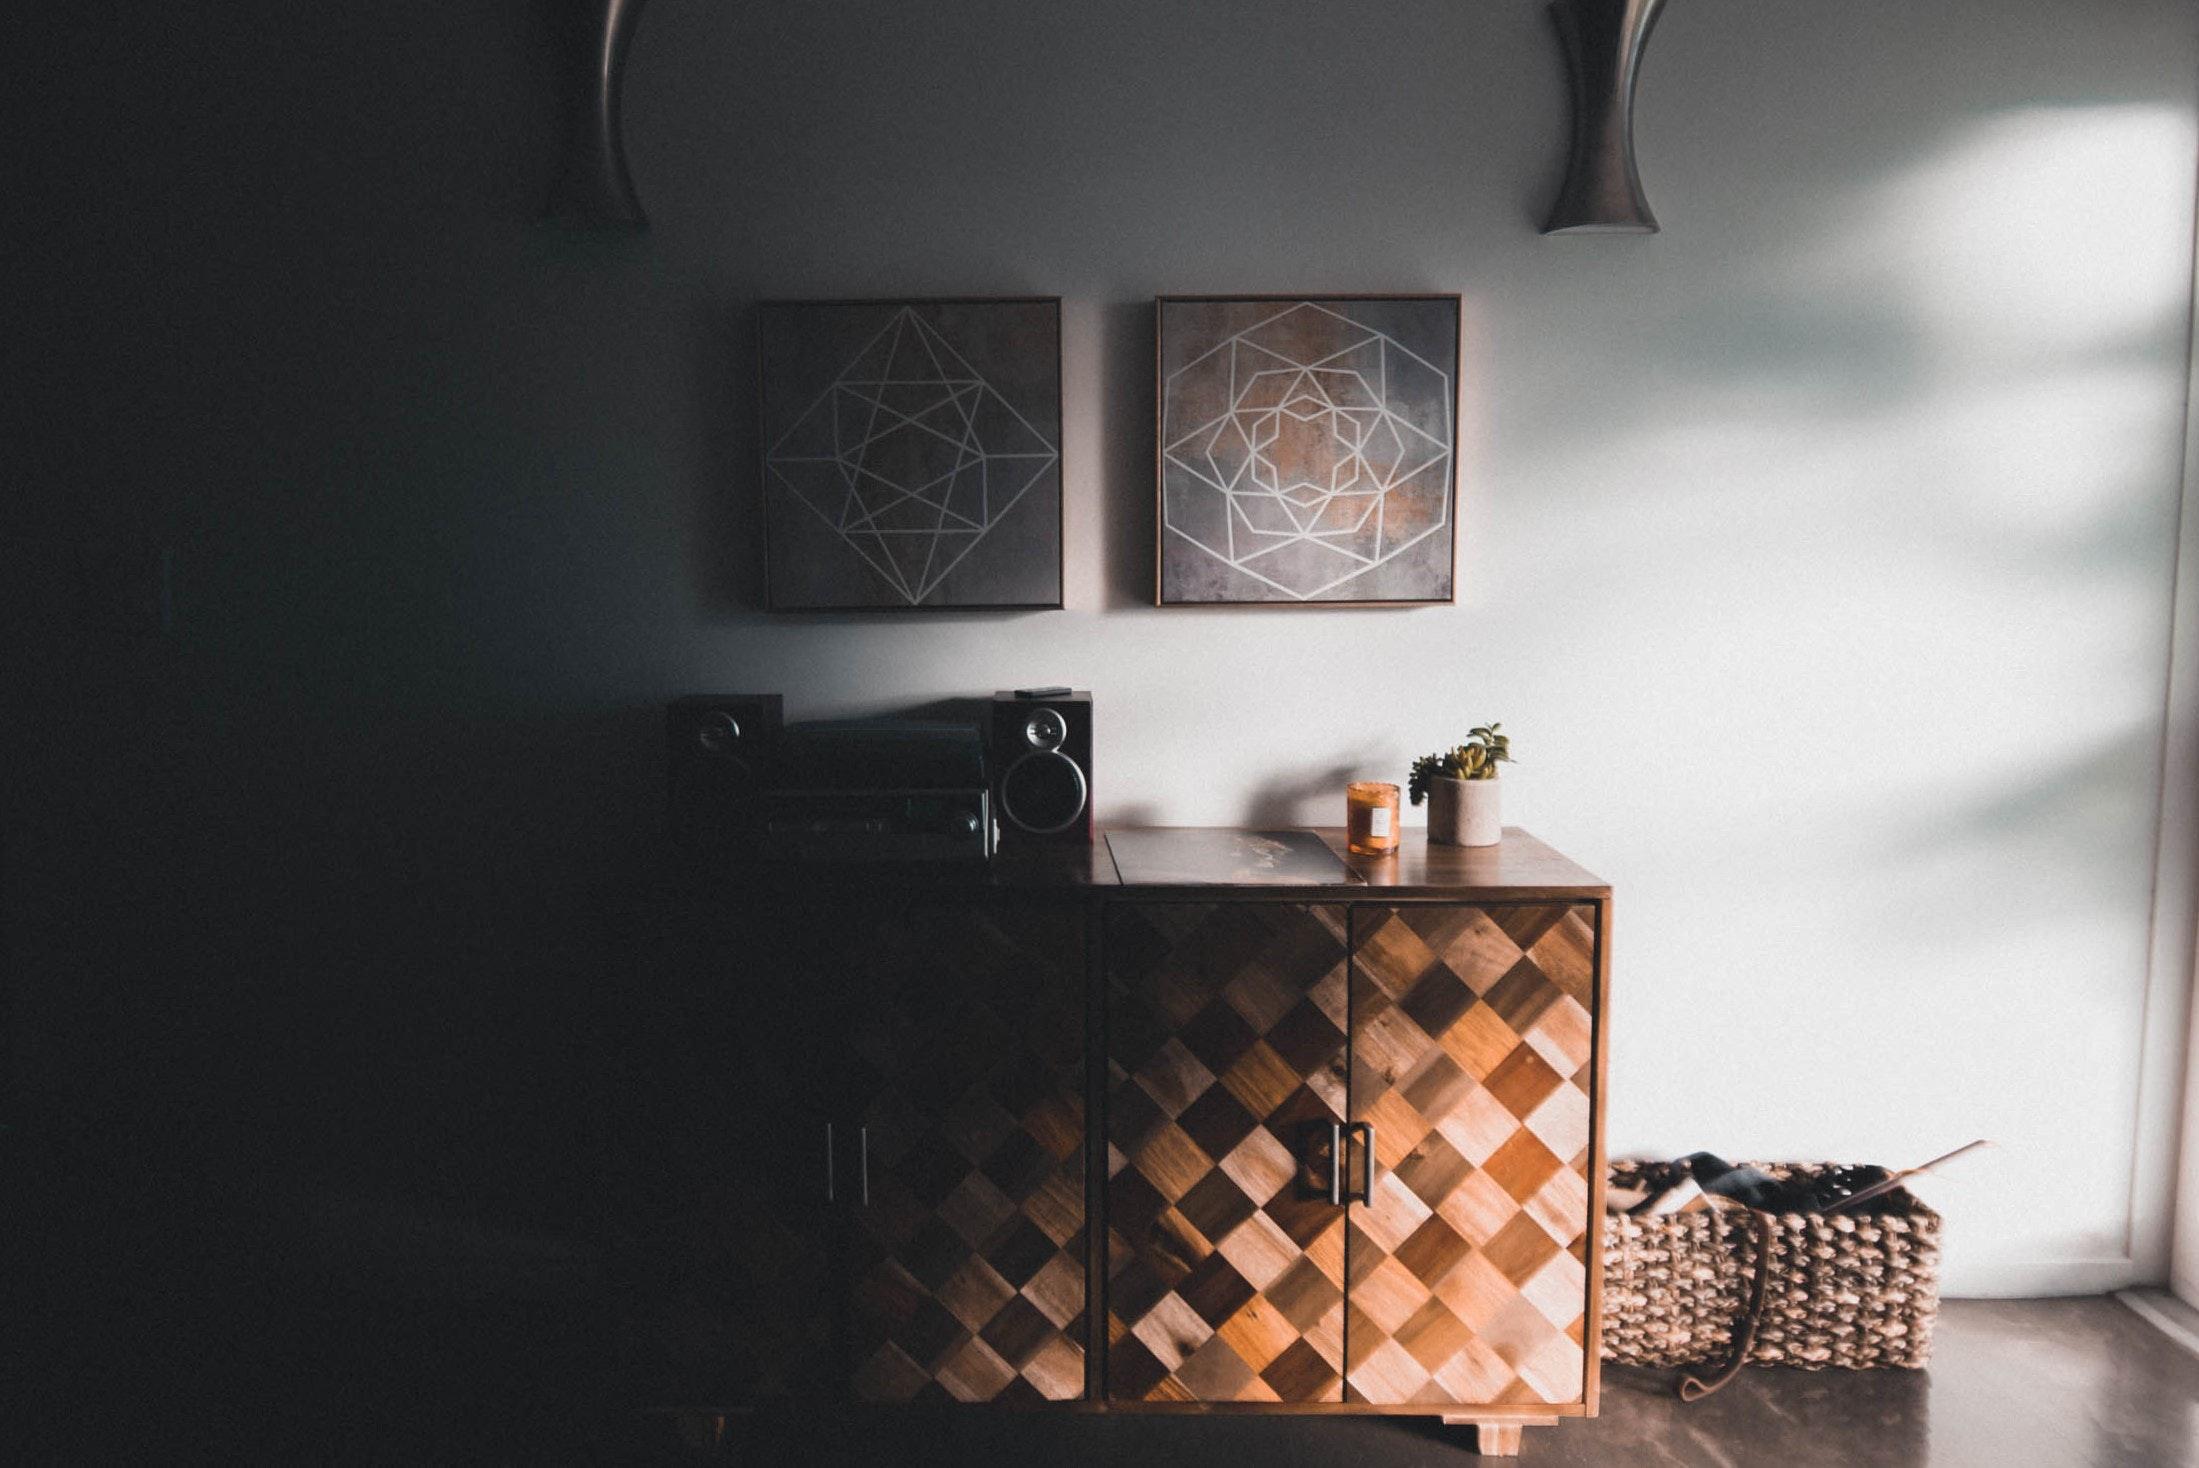 Black audio speaker on brown wooden cabinet photo